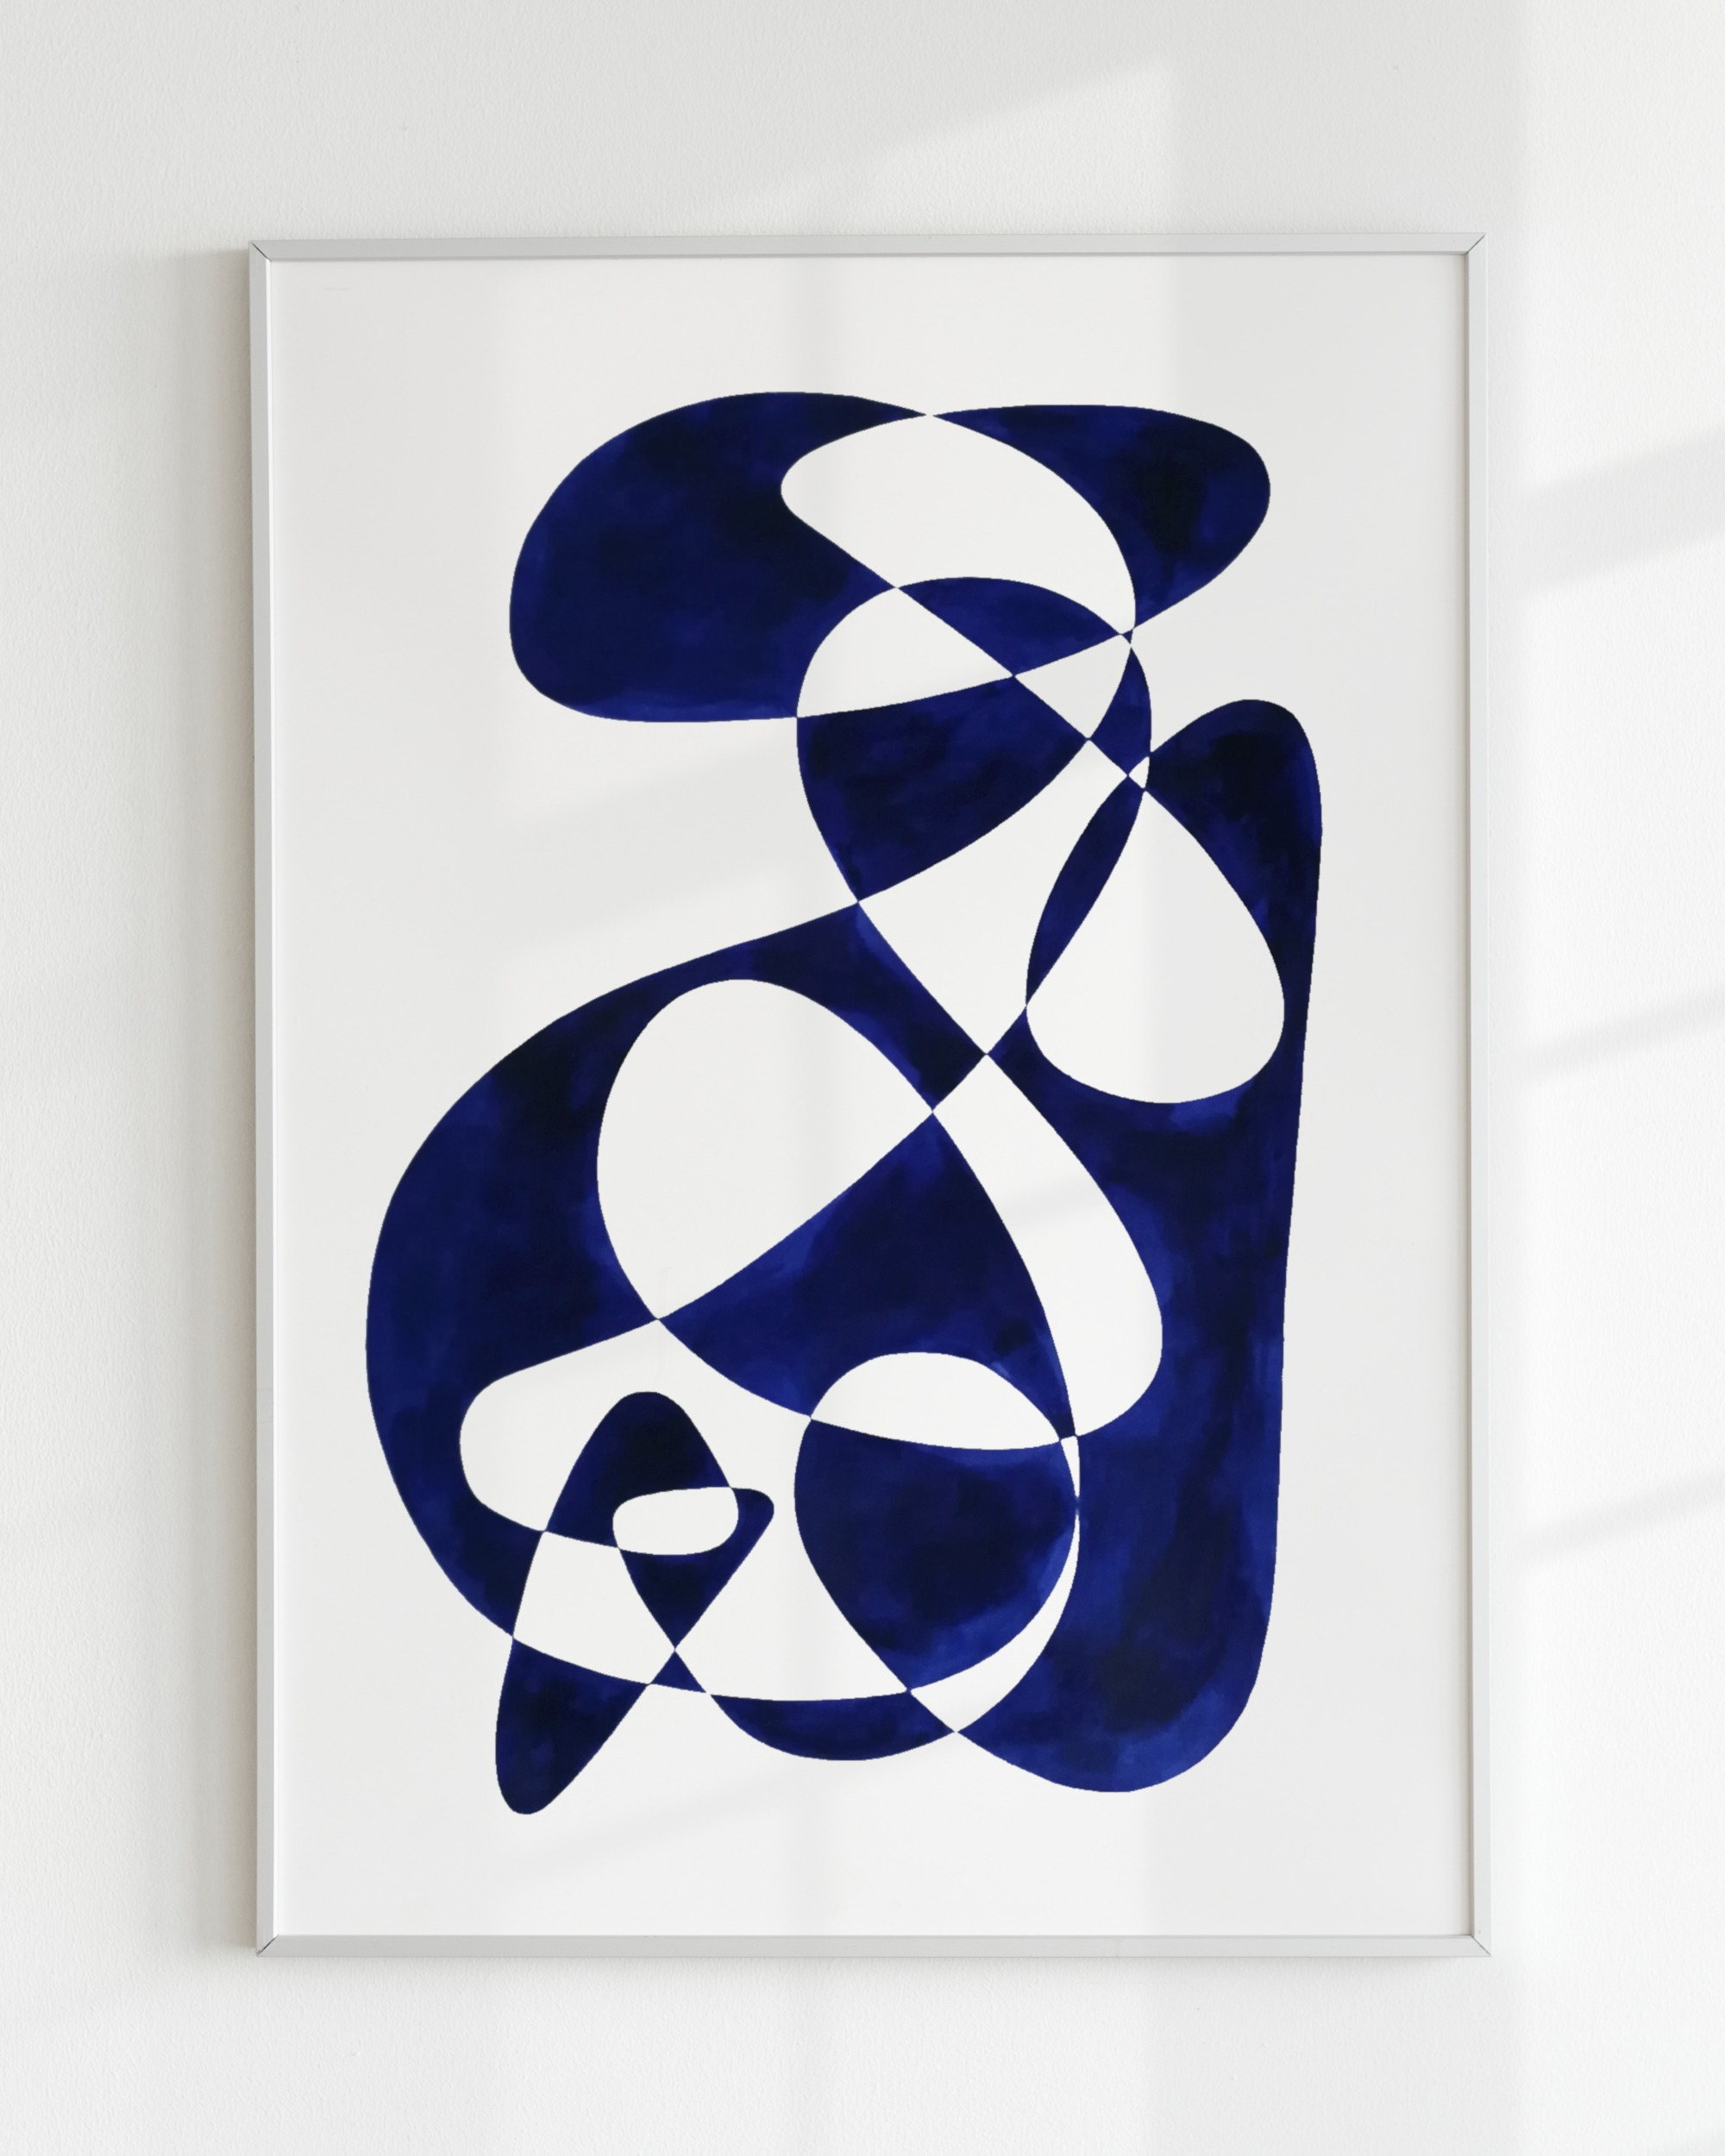 SHAPE STUDY – Bleu de prusse small III